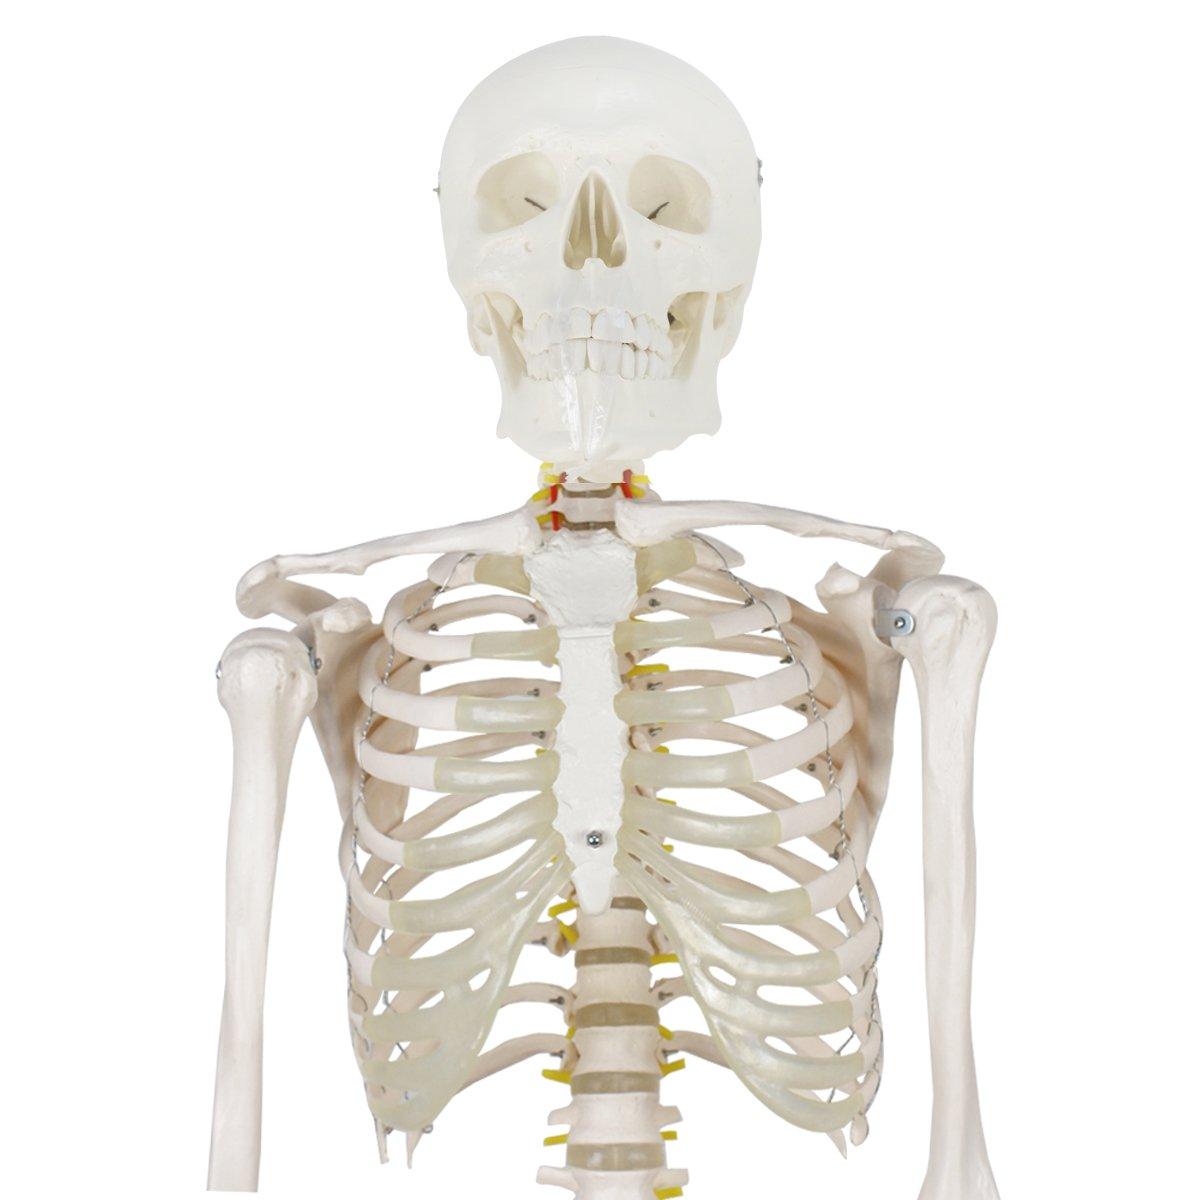 Zeny Life Size 708 Human Skeleton Model Medical Anatomical With